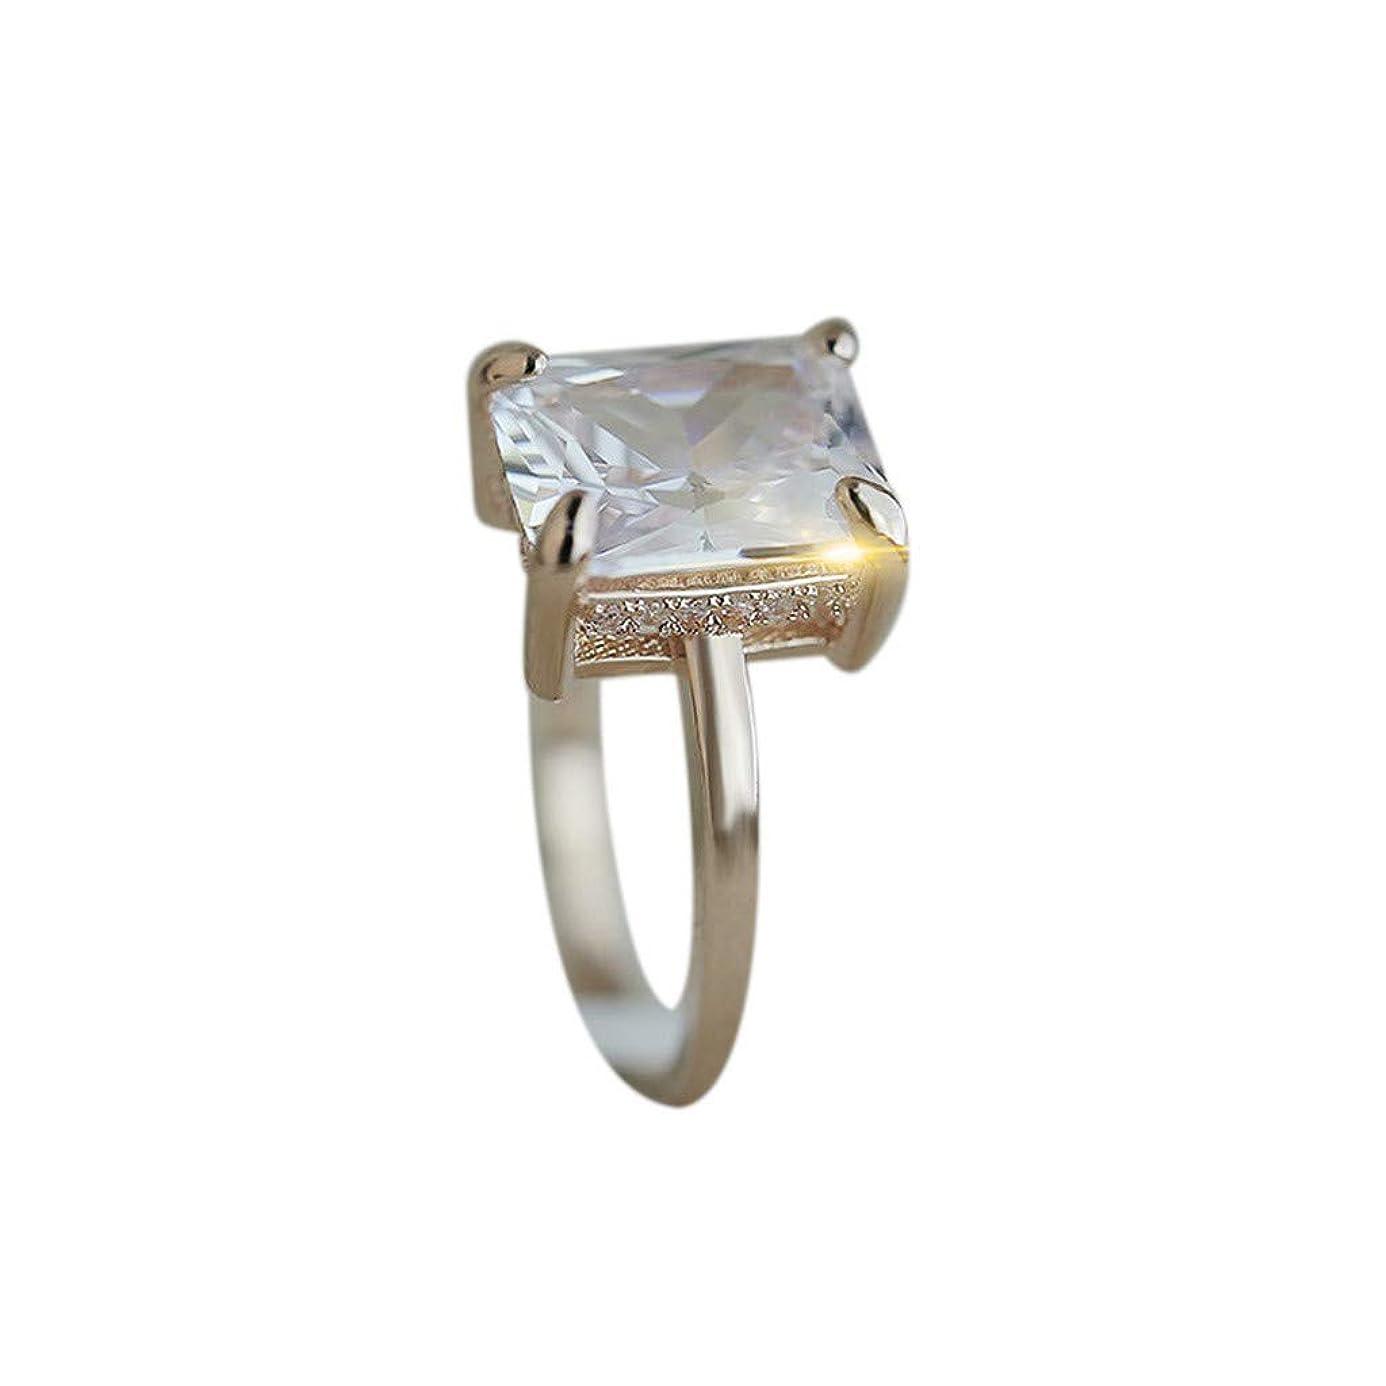 Kintaz Women's Engagement Luxury Generous Creative Four Claws Topaz Diamonds Jewelry (6, Rose Gold)